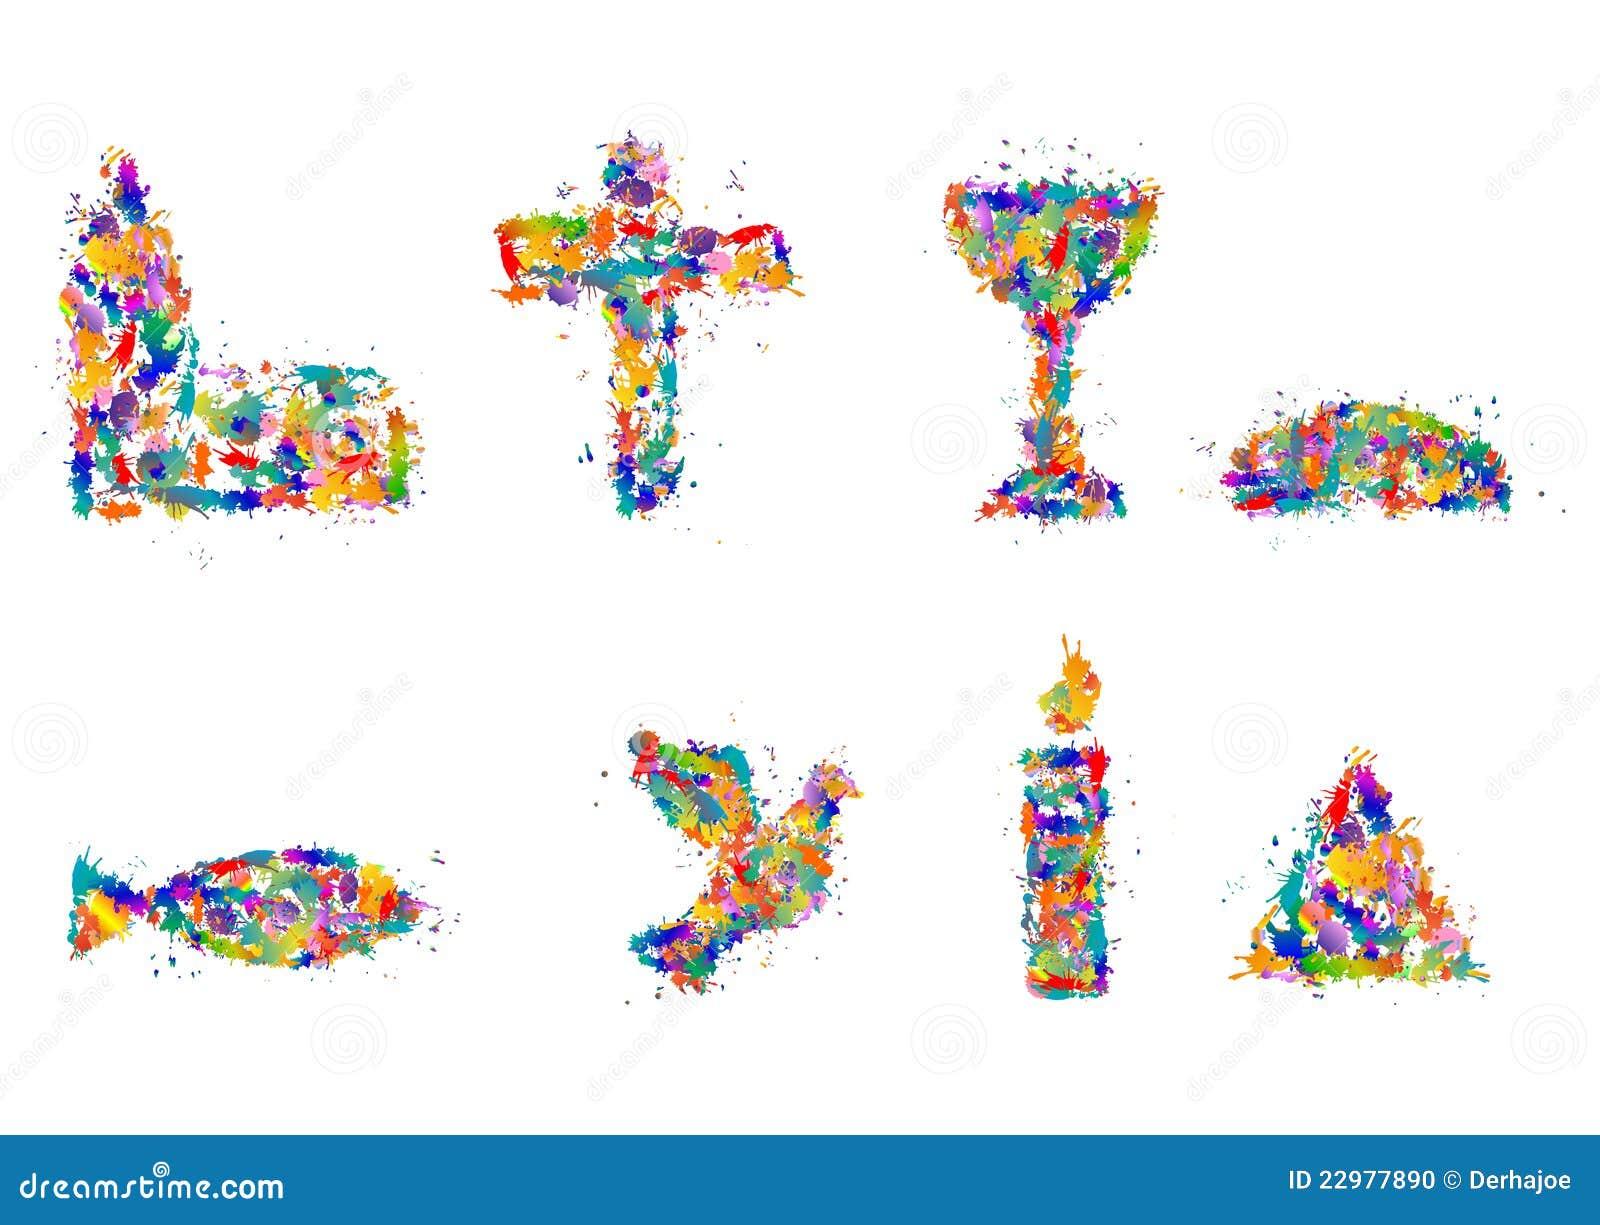 Christian symbols from splashes of color, dab - Symbol Set.